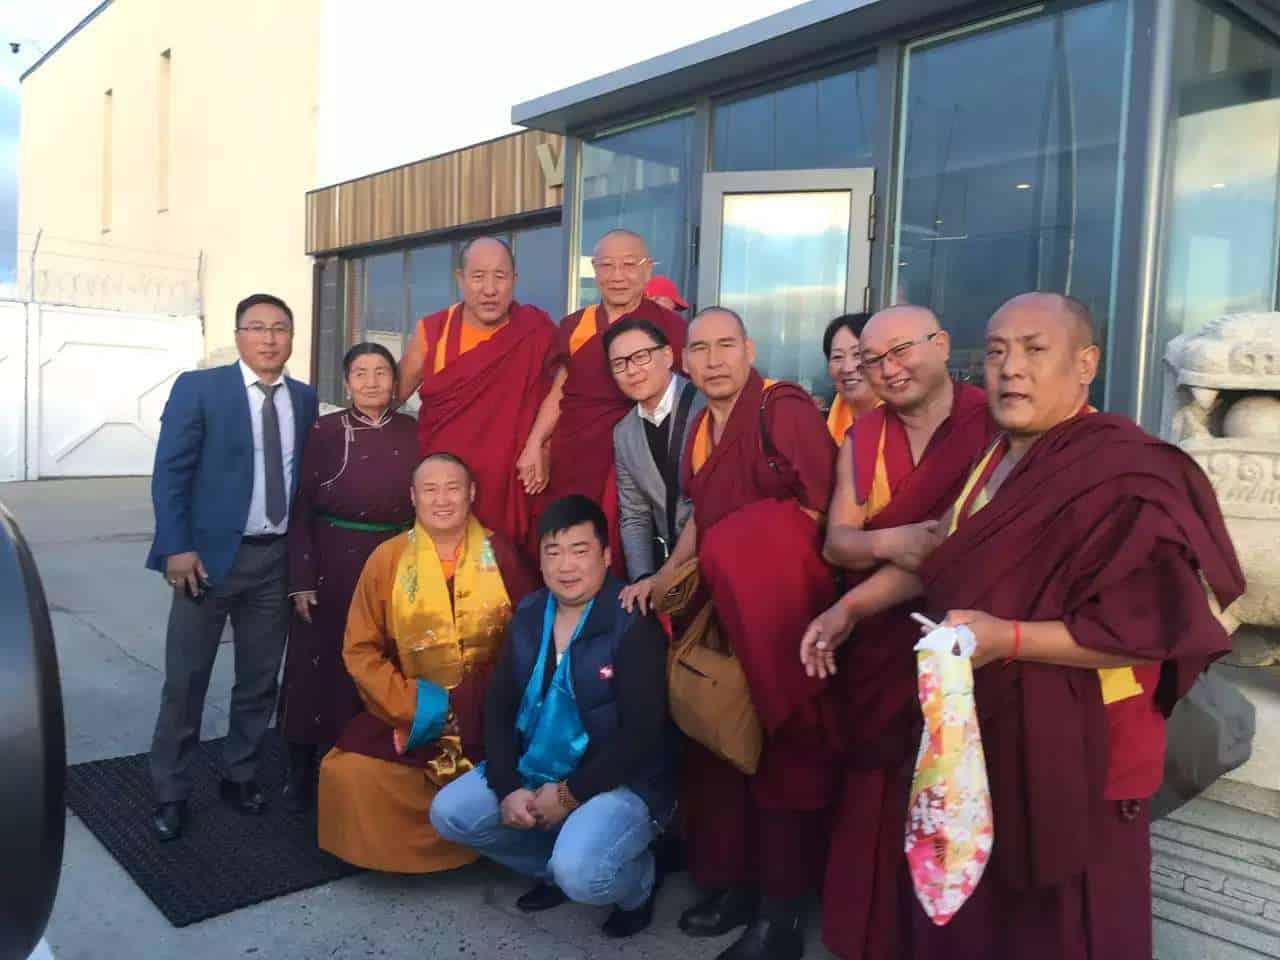 gosok-rinpoche-mongolia-2016-2682412af798c342aa75eee85e50d13